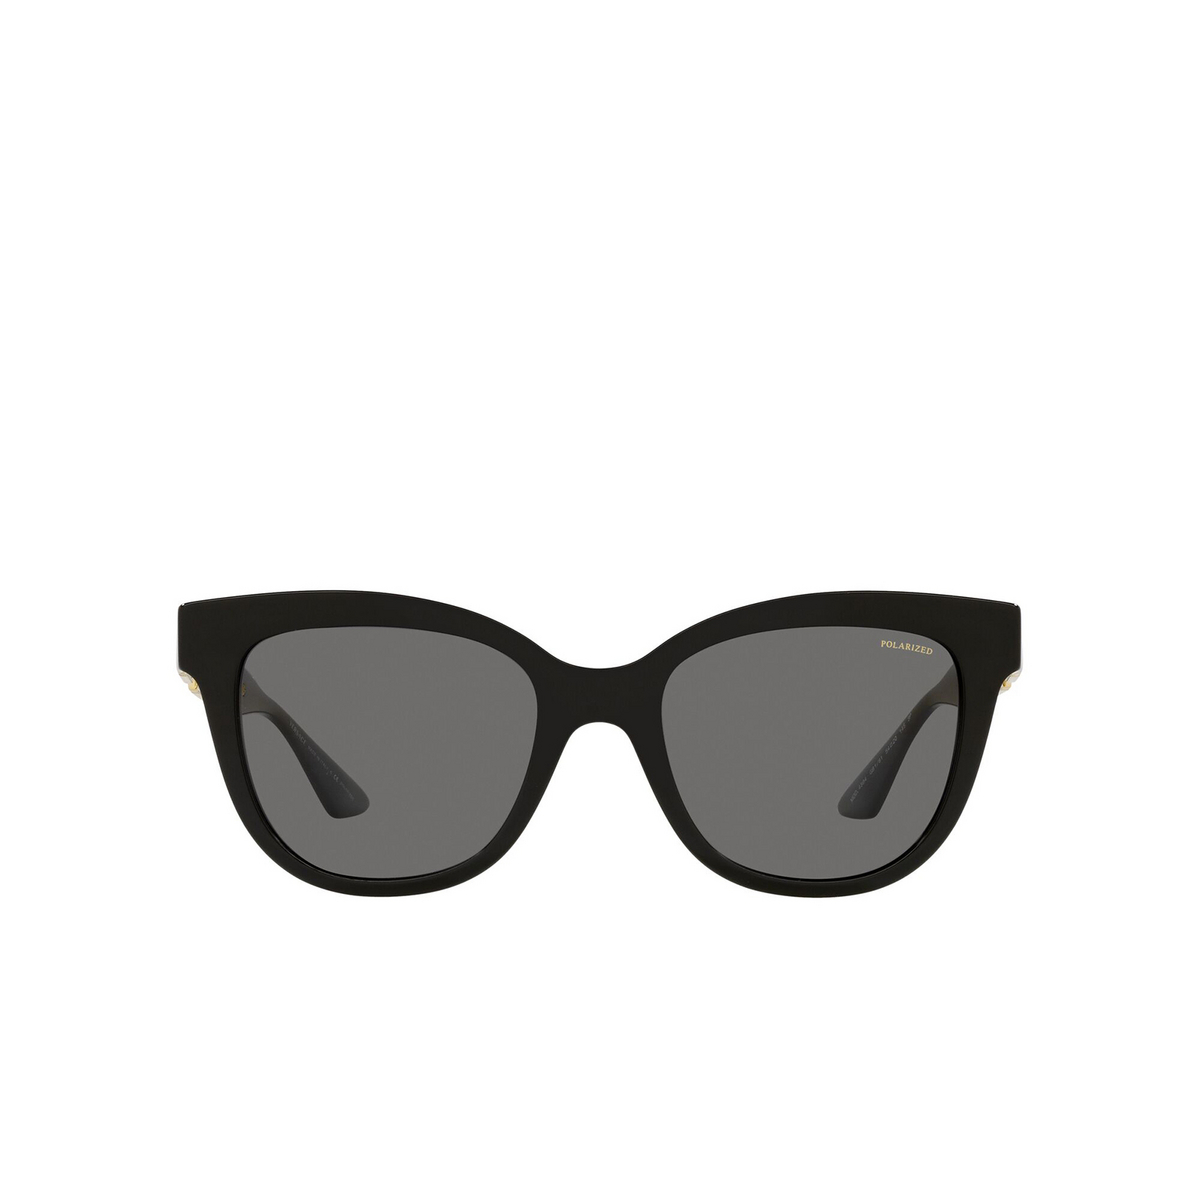 Versace® Cat-eye Sunglasses: VE4394 color Black GB1/81 - front view.